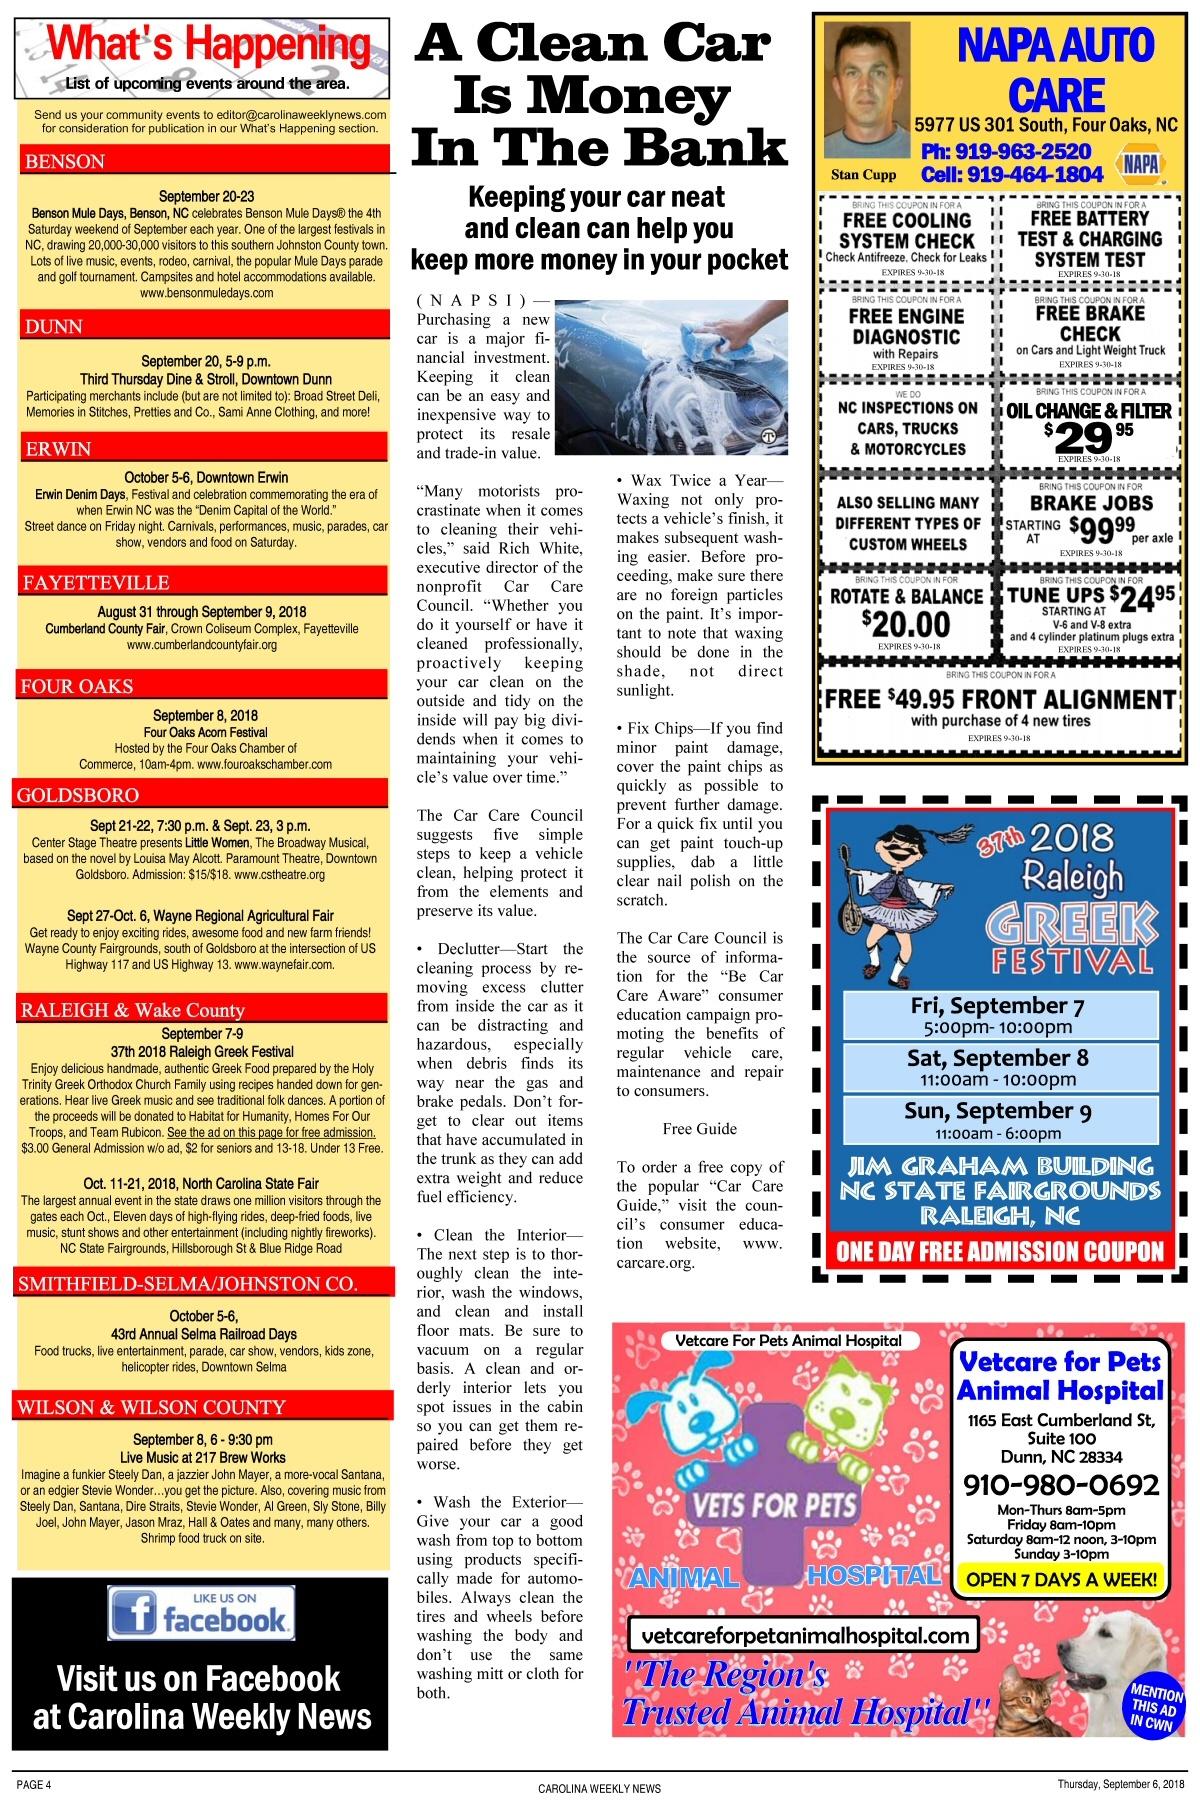 Eastern ncs free news weekly since 1989 carolina weekly news online solutioingenieria Choice Image